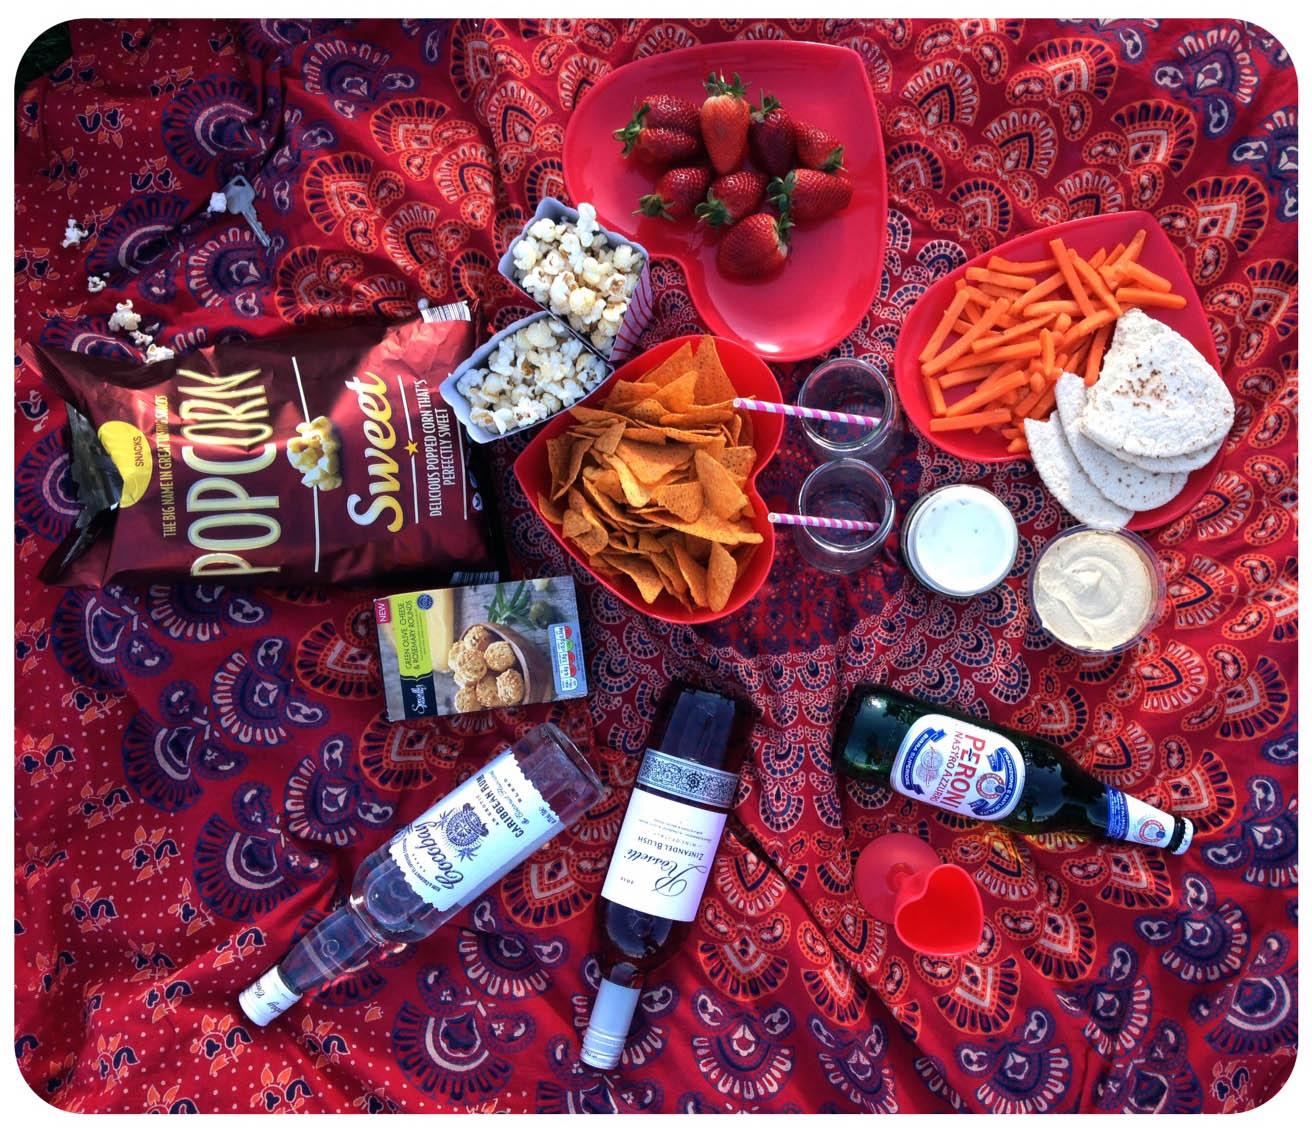 summer picnic daisy kent